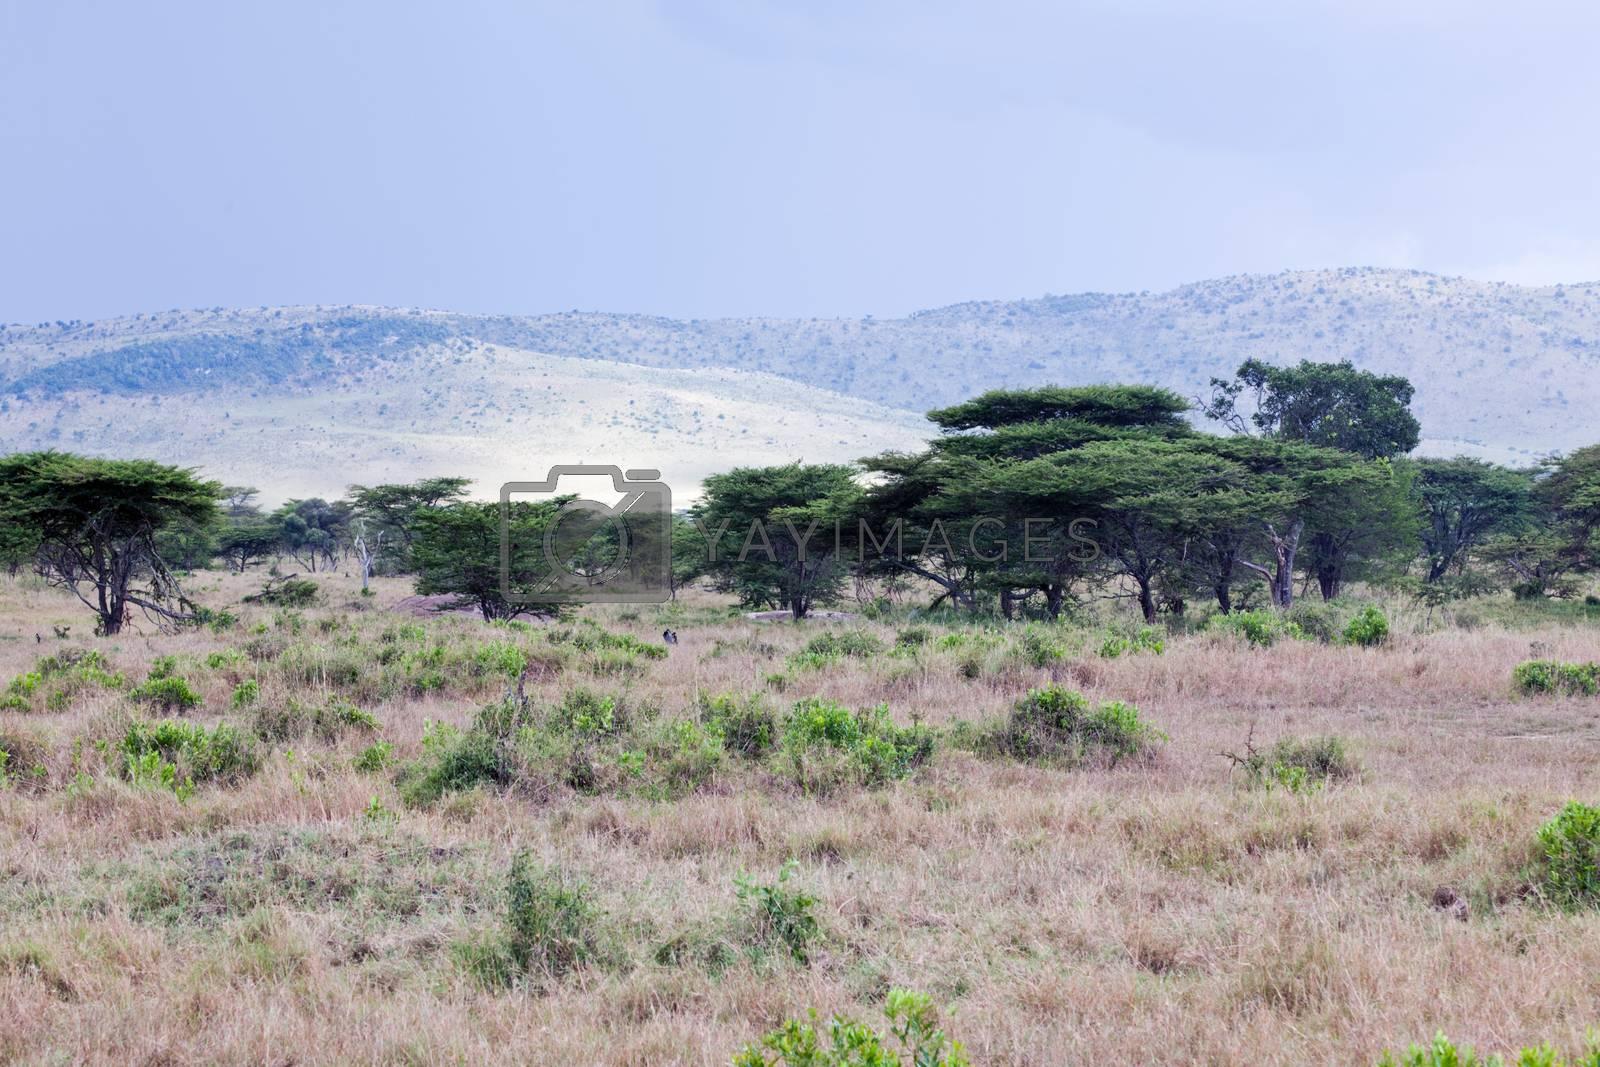 Royalty free image of Savanna landscape in Africa, Serengeti, Tanzania by photocreo